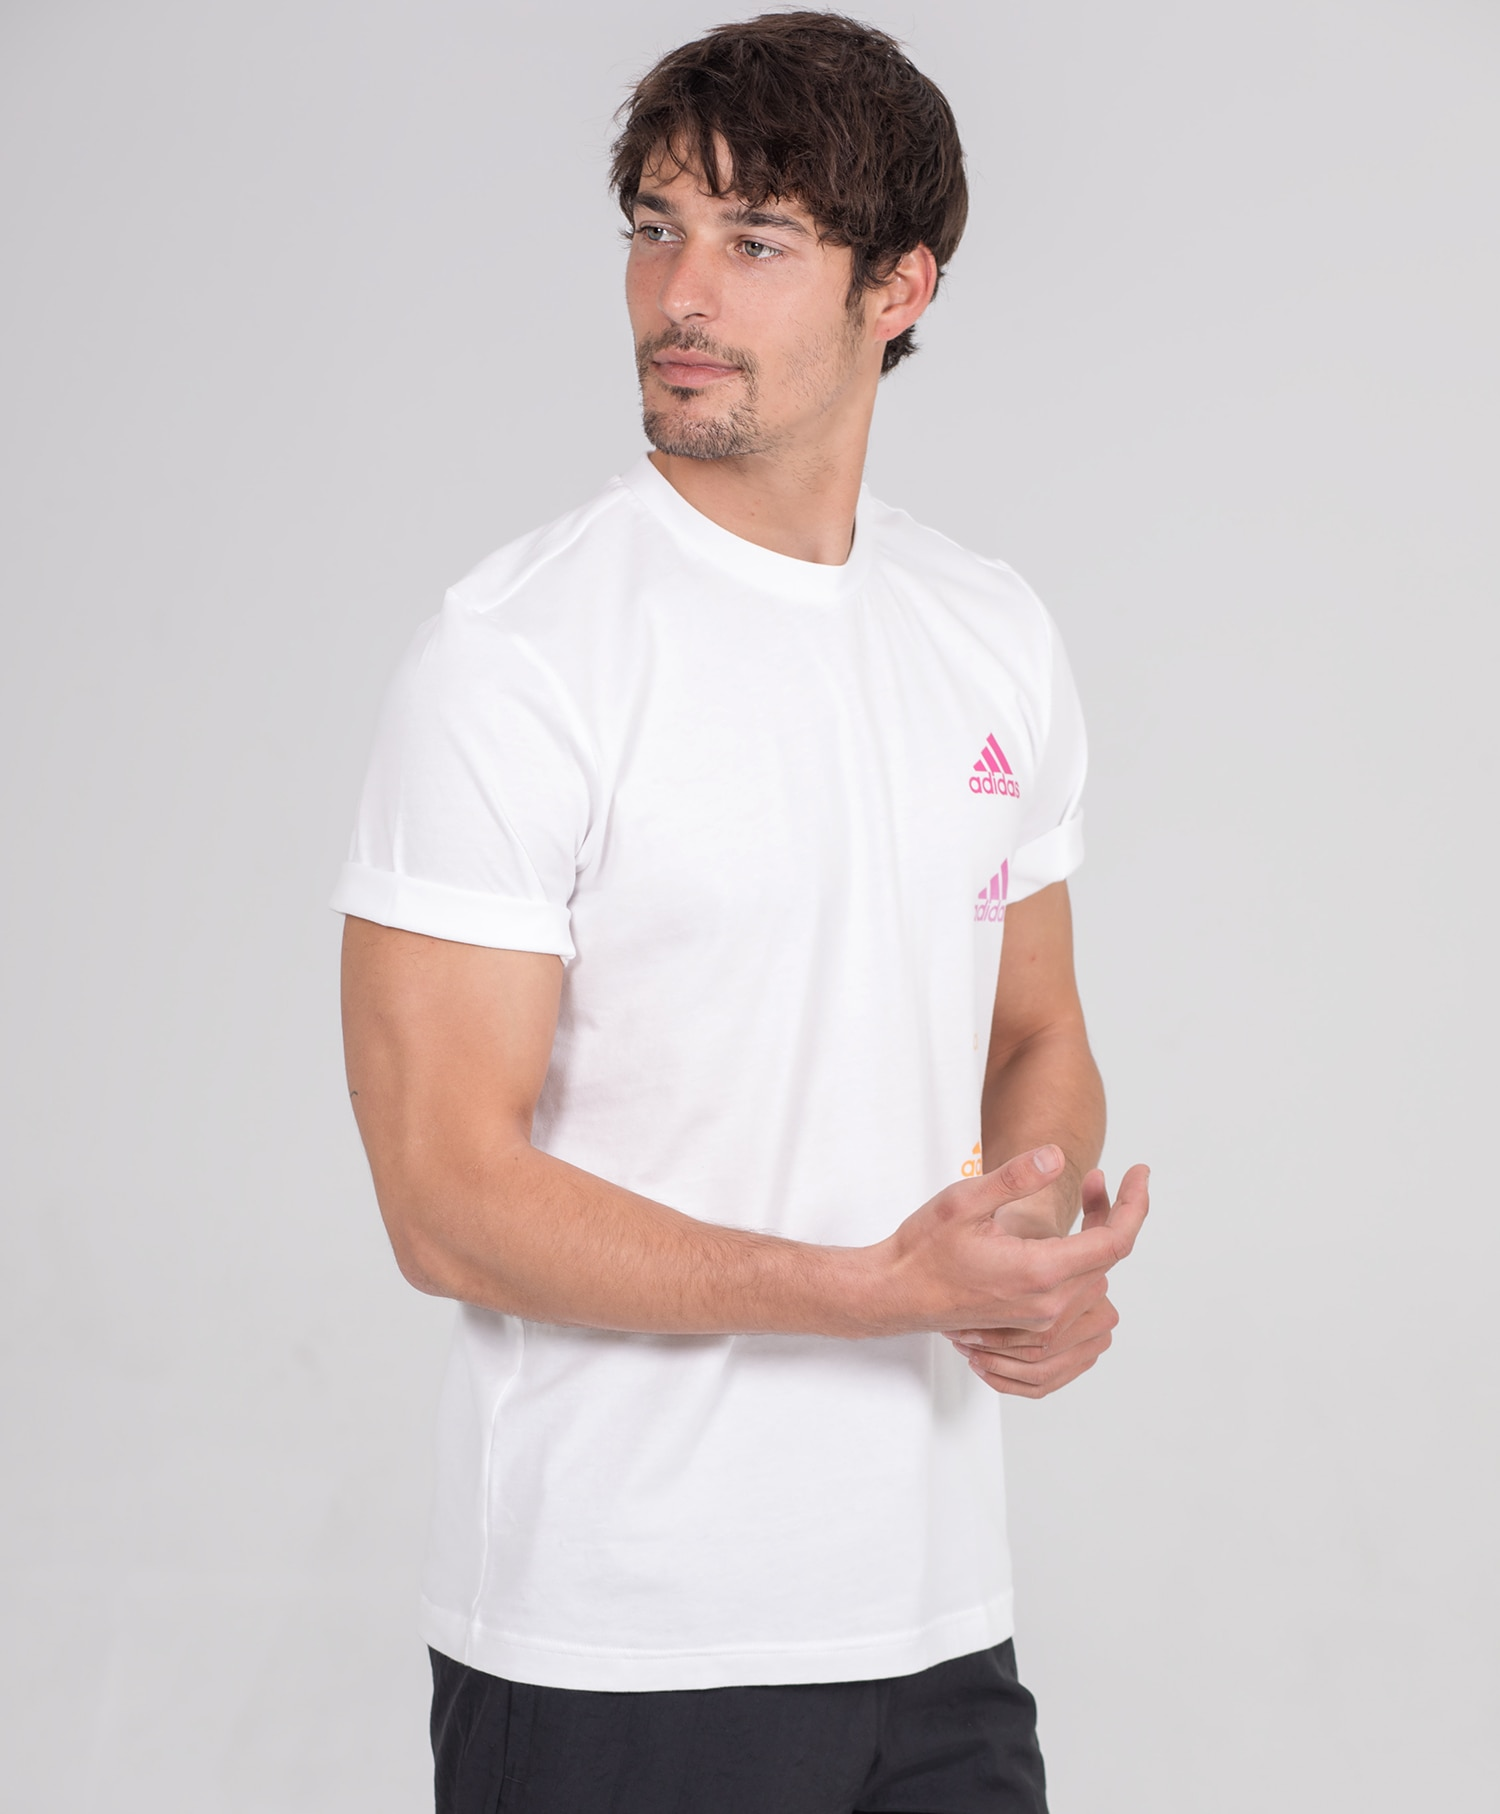 Adidas Favs Tee